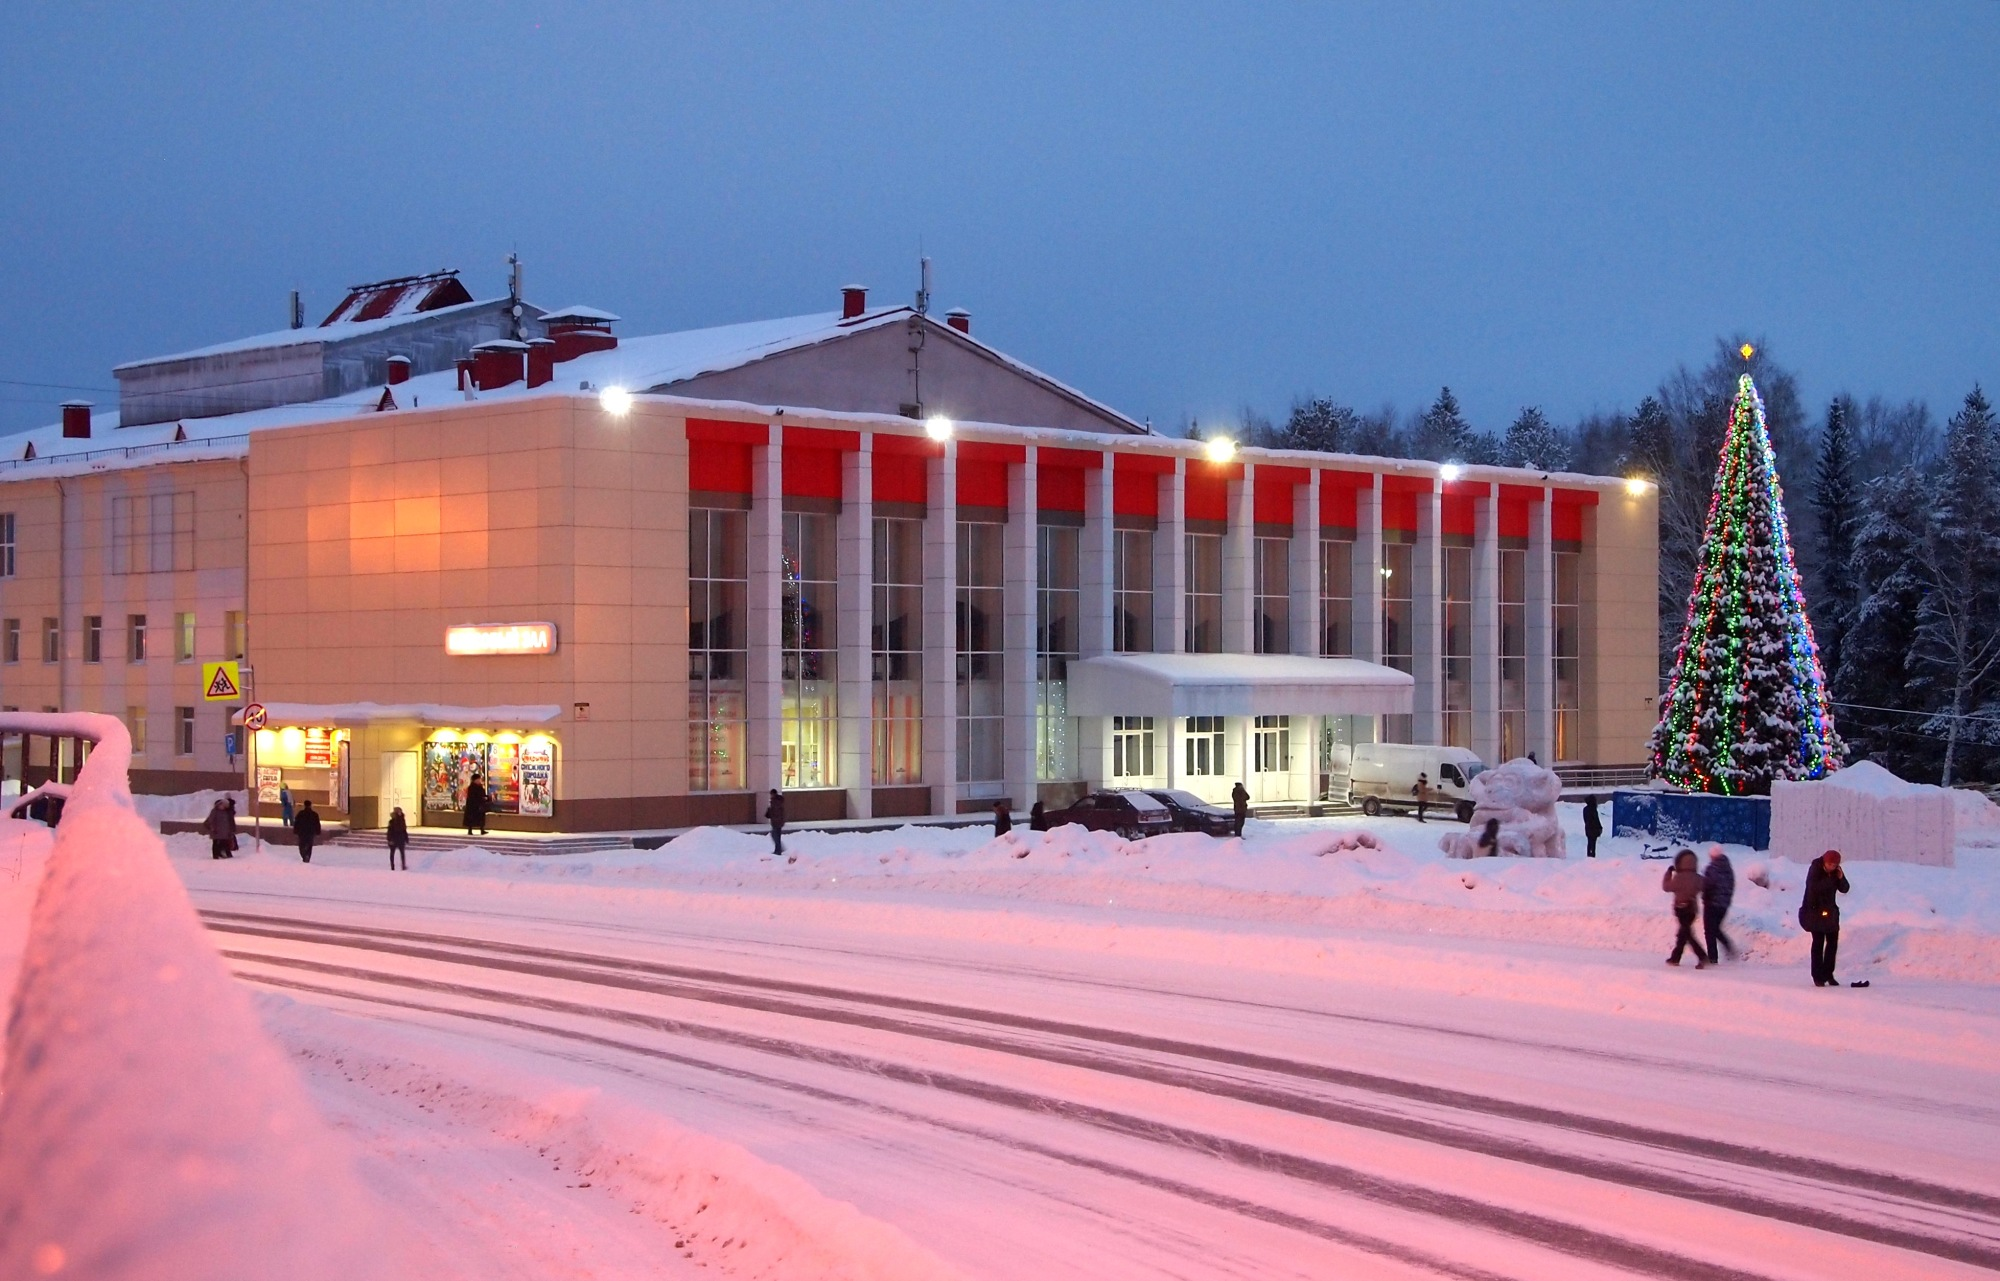 Дворец культуры в Качканаре. Фото: Удинцева Т.А.